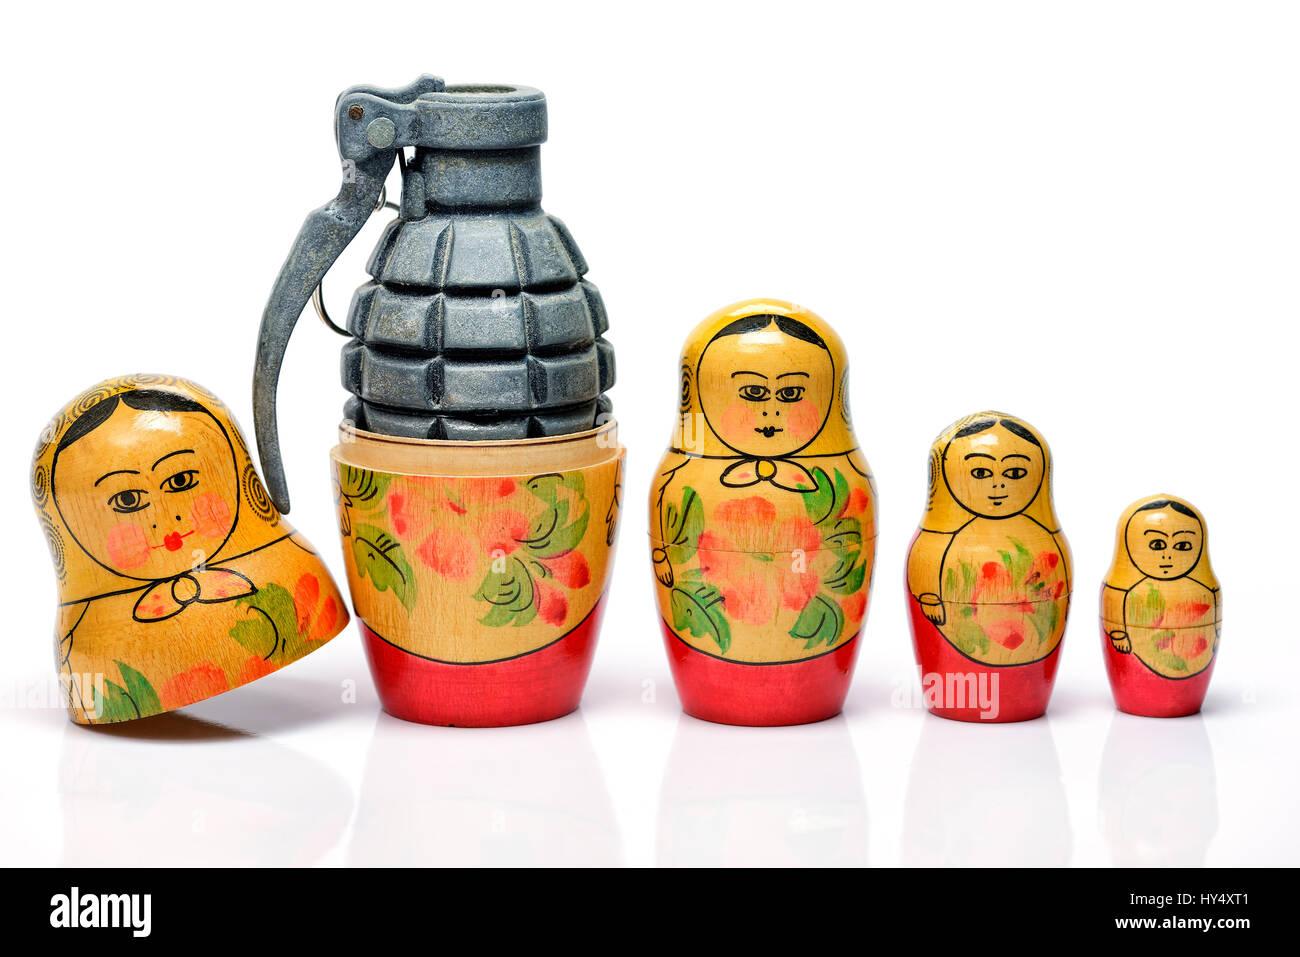 Russian Matroschka with grenade, the Russian military, Russische Matroschka mit Handgranate, russisches Militaer Stock Photo